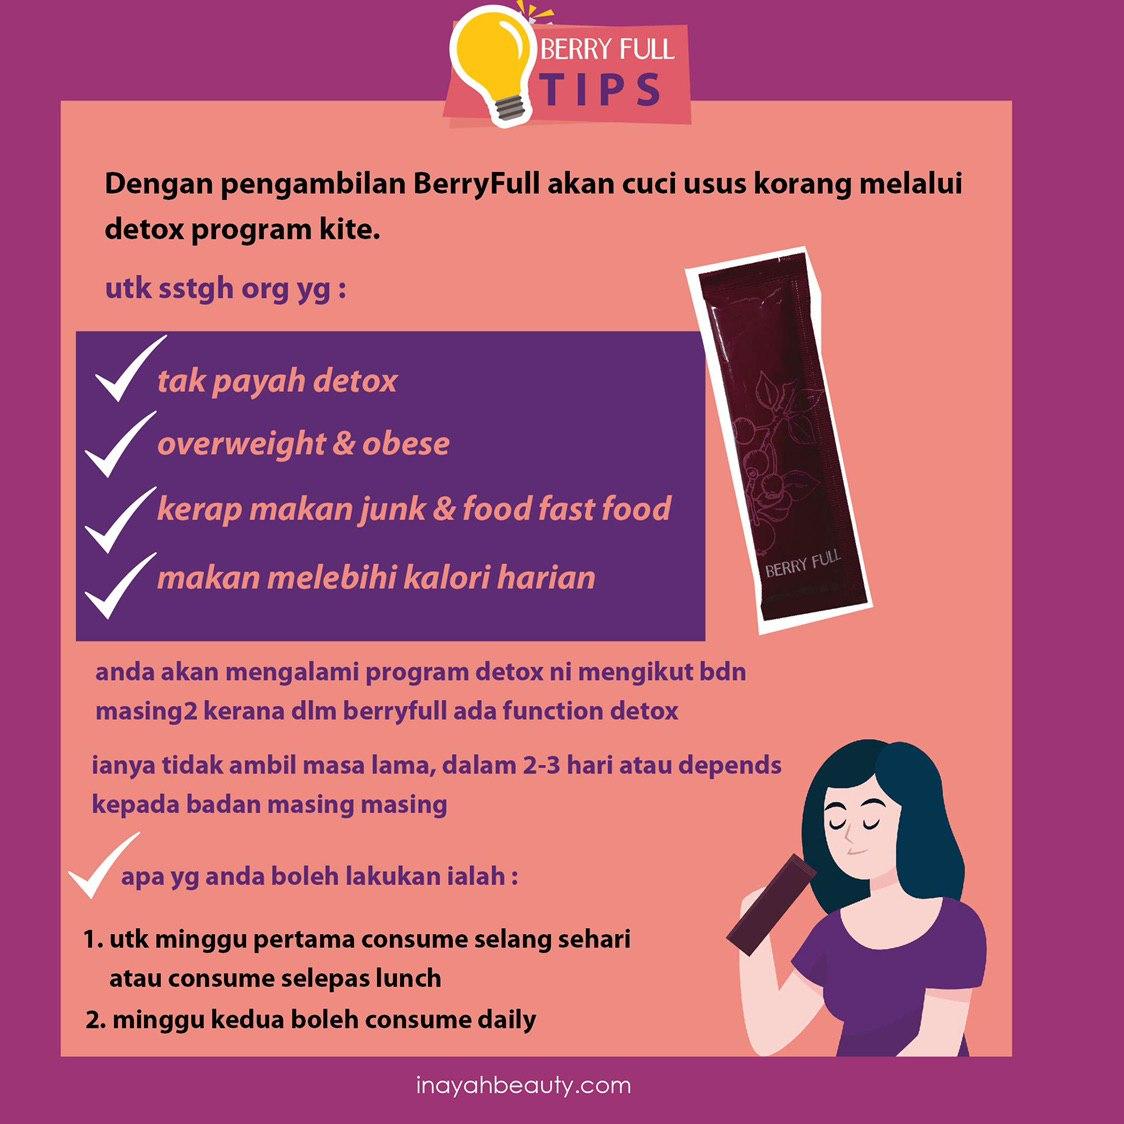 berryfull inayah kervenglow tips detox how to consume.jpg